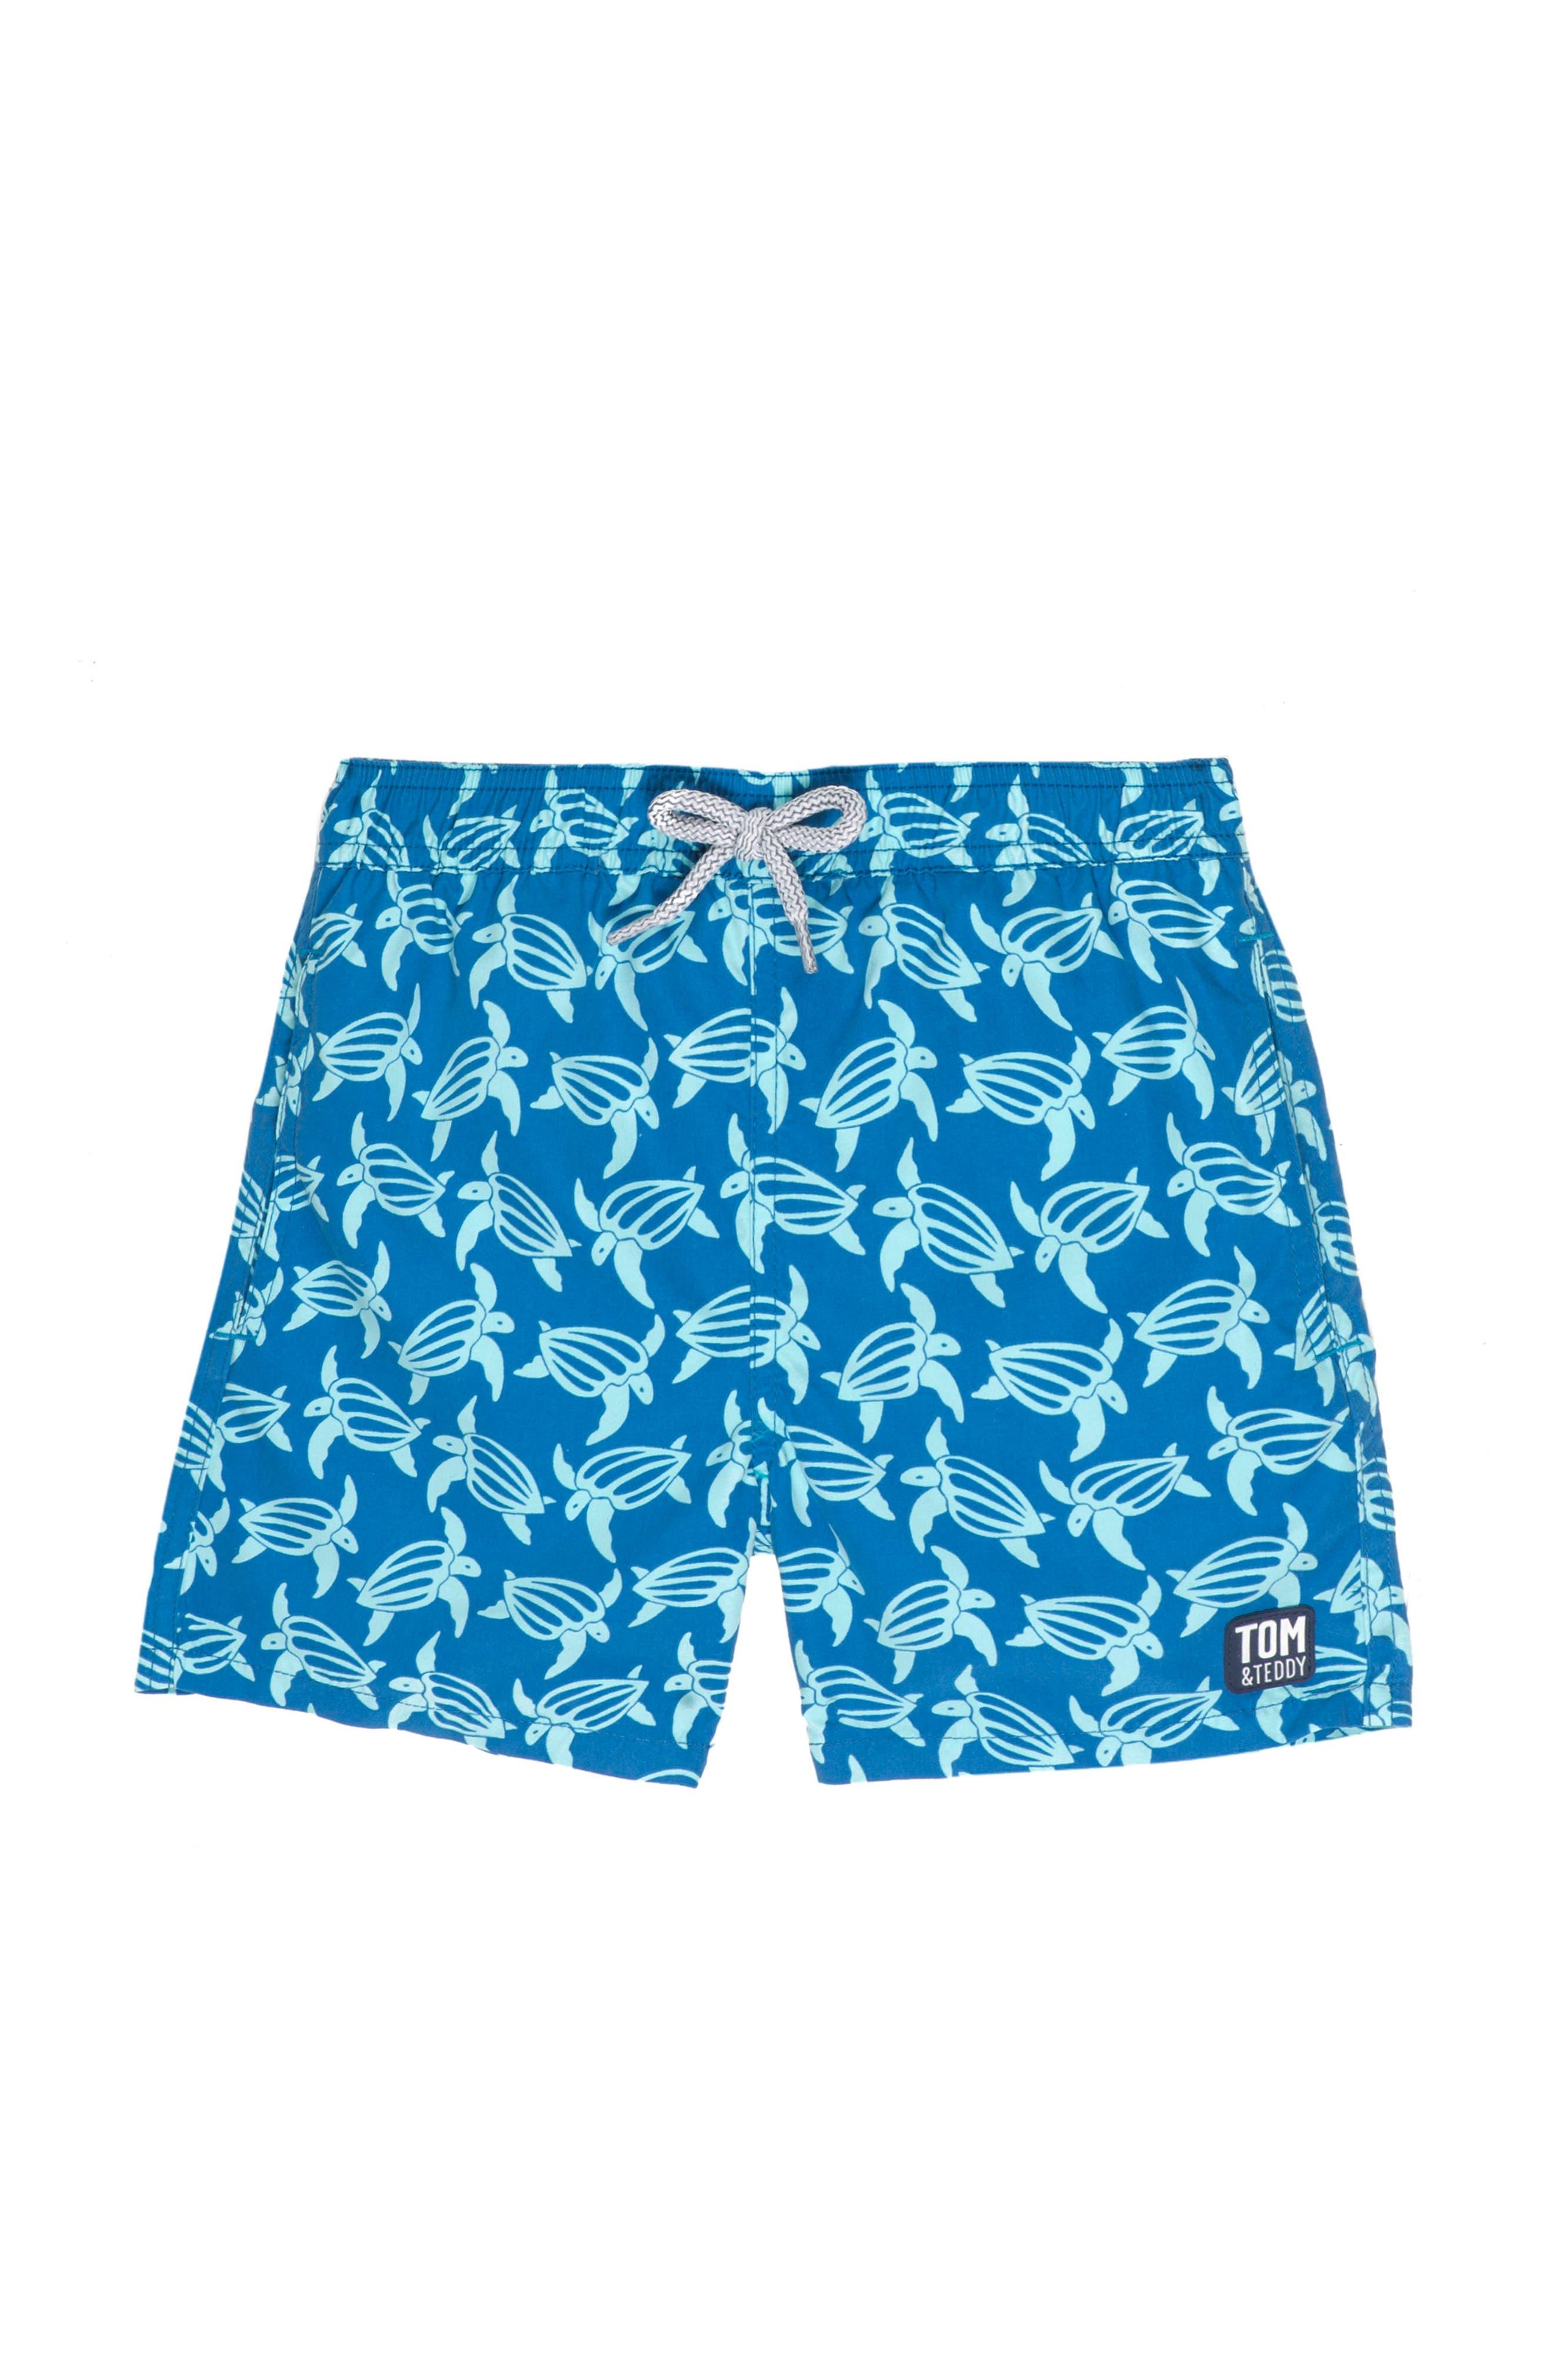 Main Image - Tom & Teddy Turtle Swim Trunks (Toddler Boys, Little Boys & Big Boys)